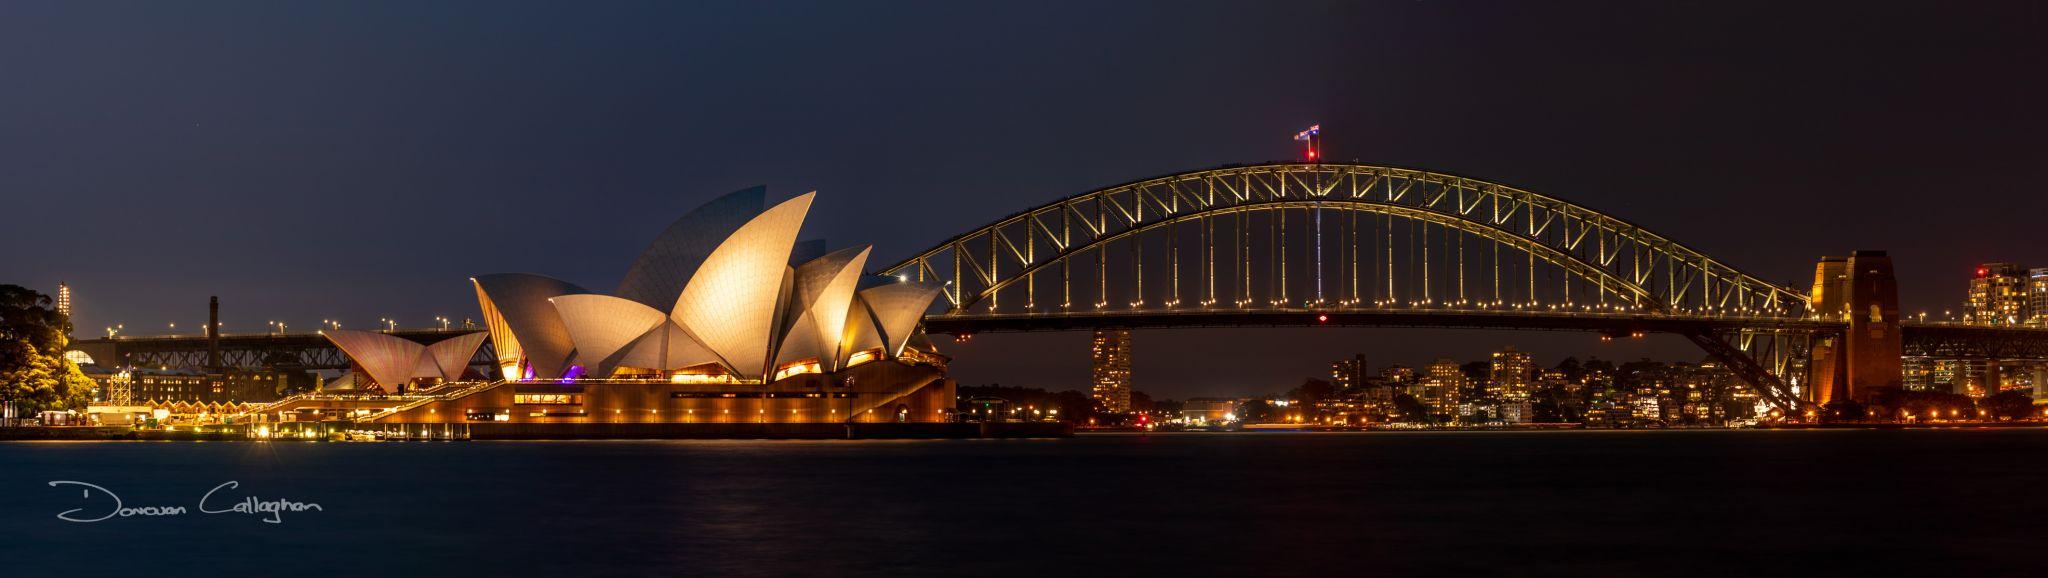 Sydney Harbour Bridge & Opera House at night, Australia